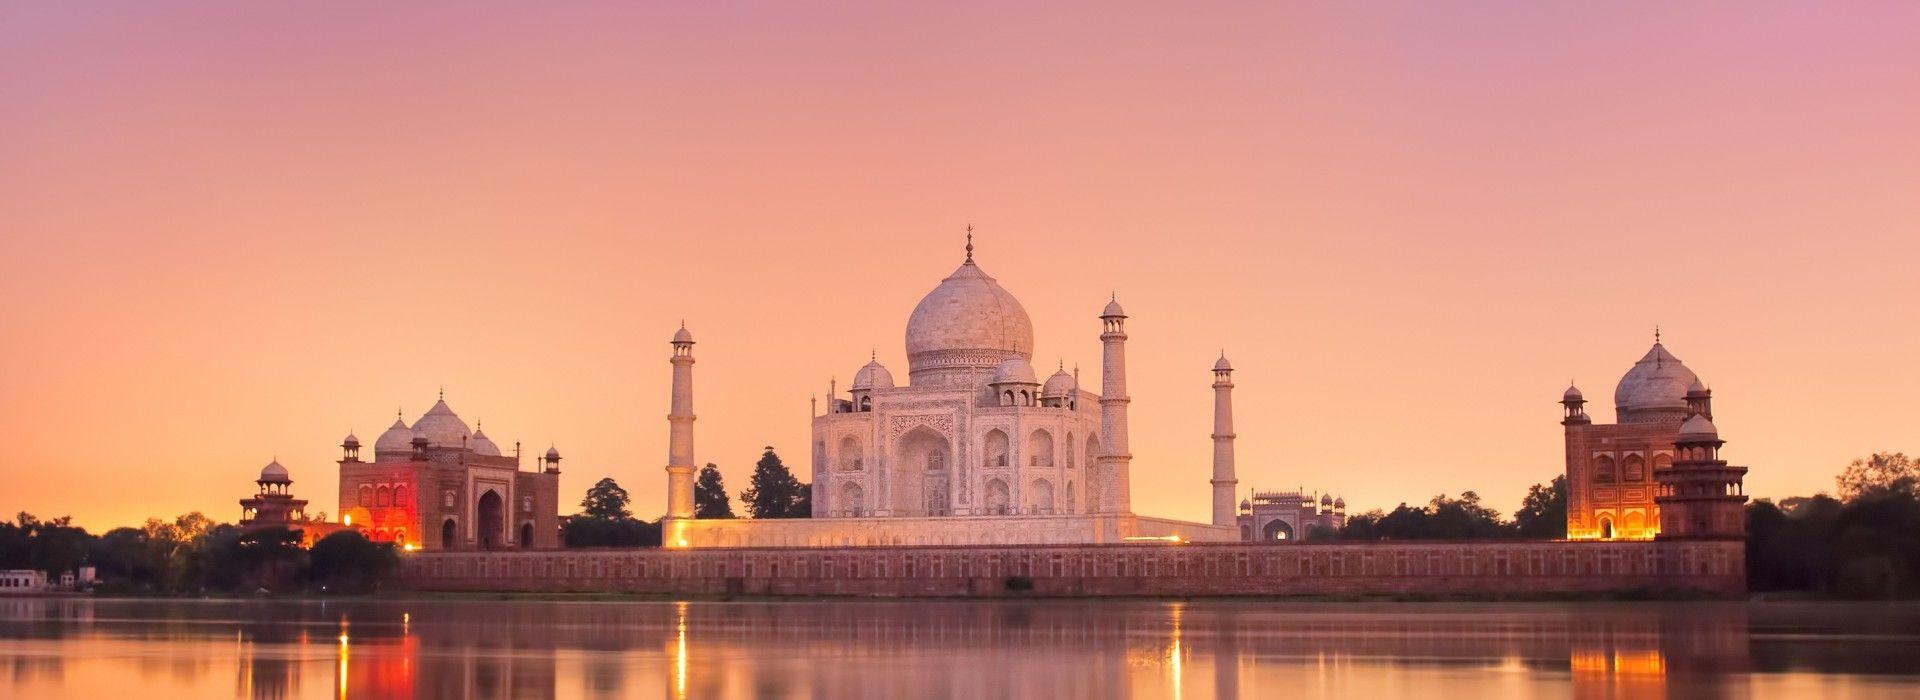 Holi Tours in Delhi & Golden Triangle